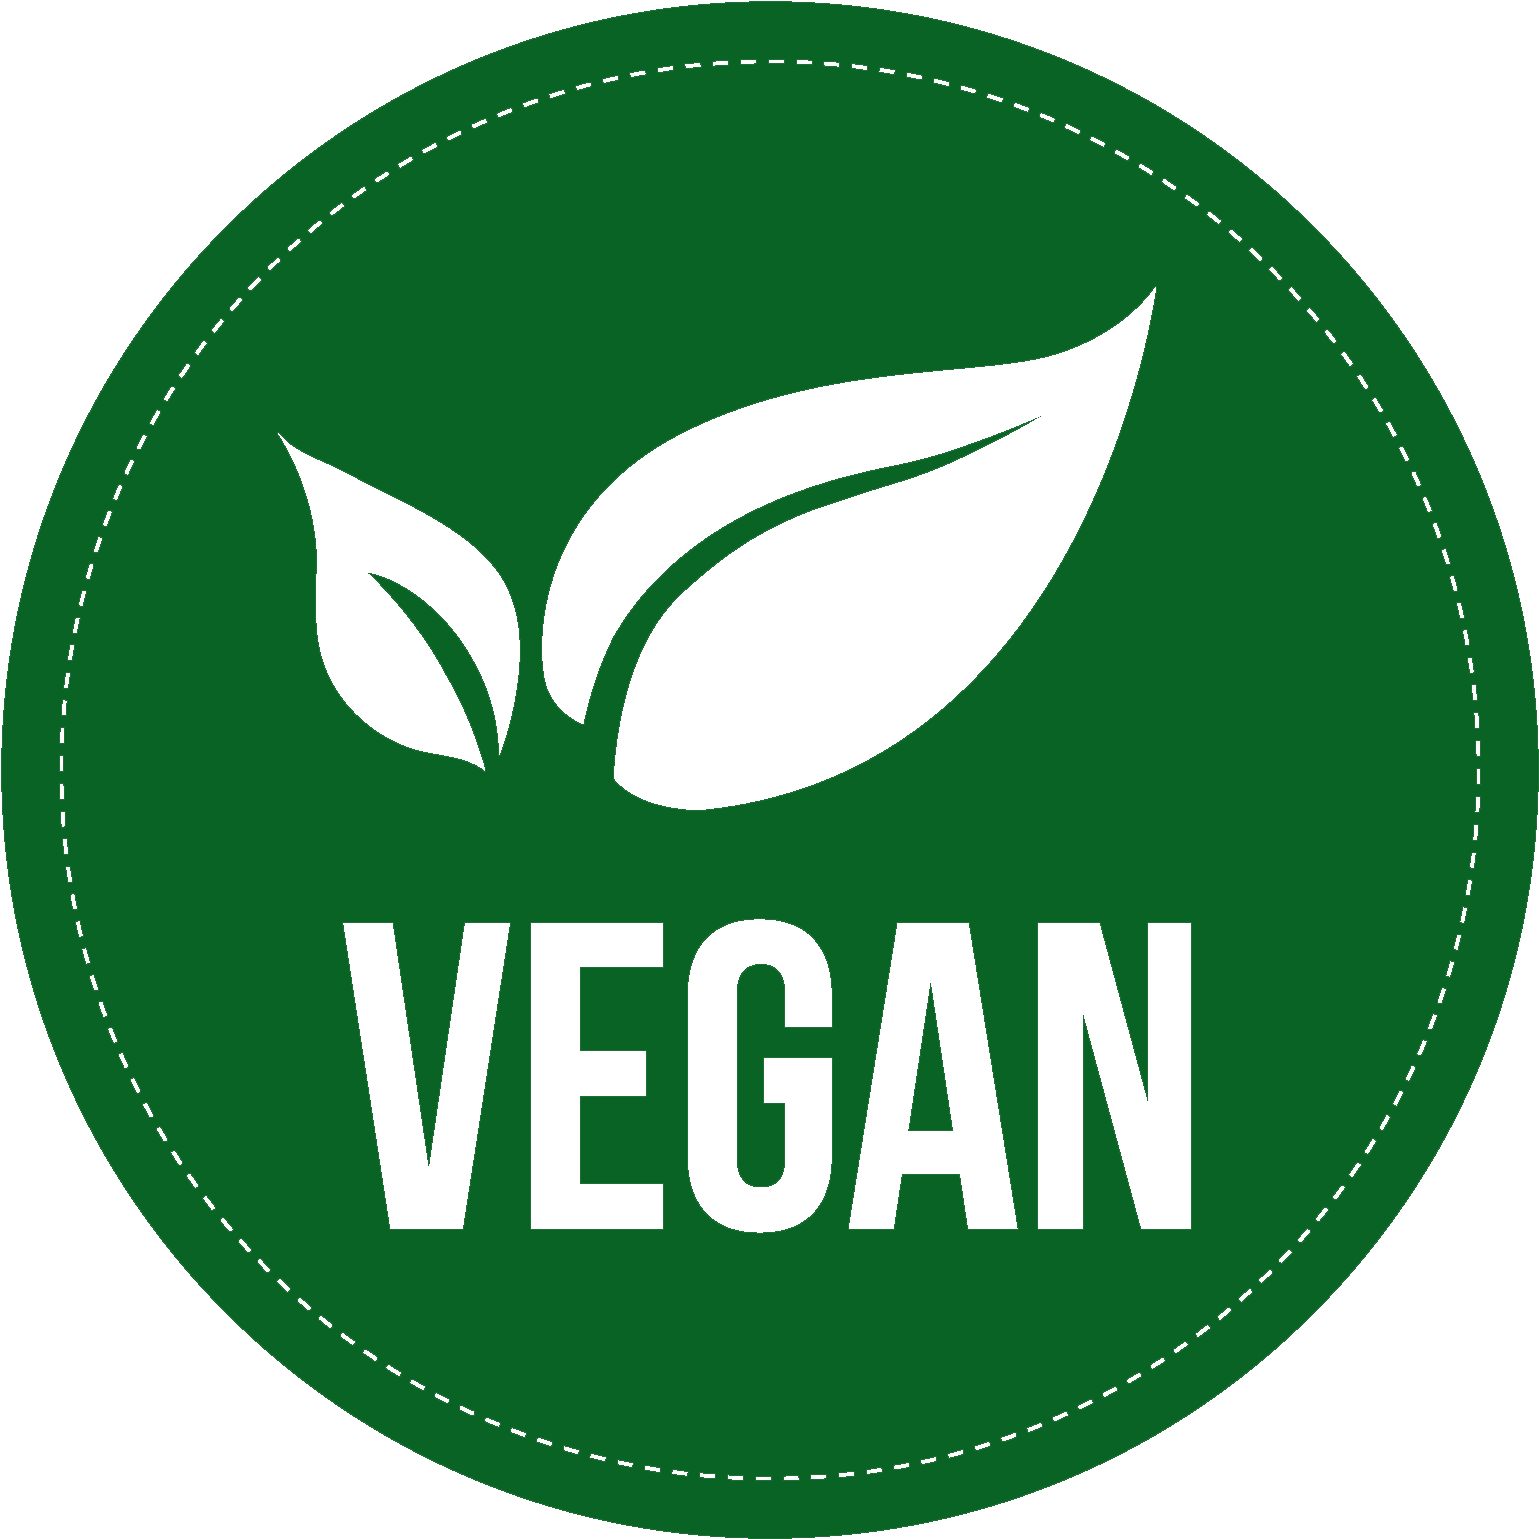 vegan-symbol-logo